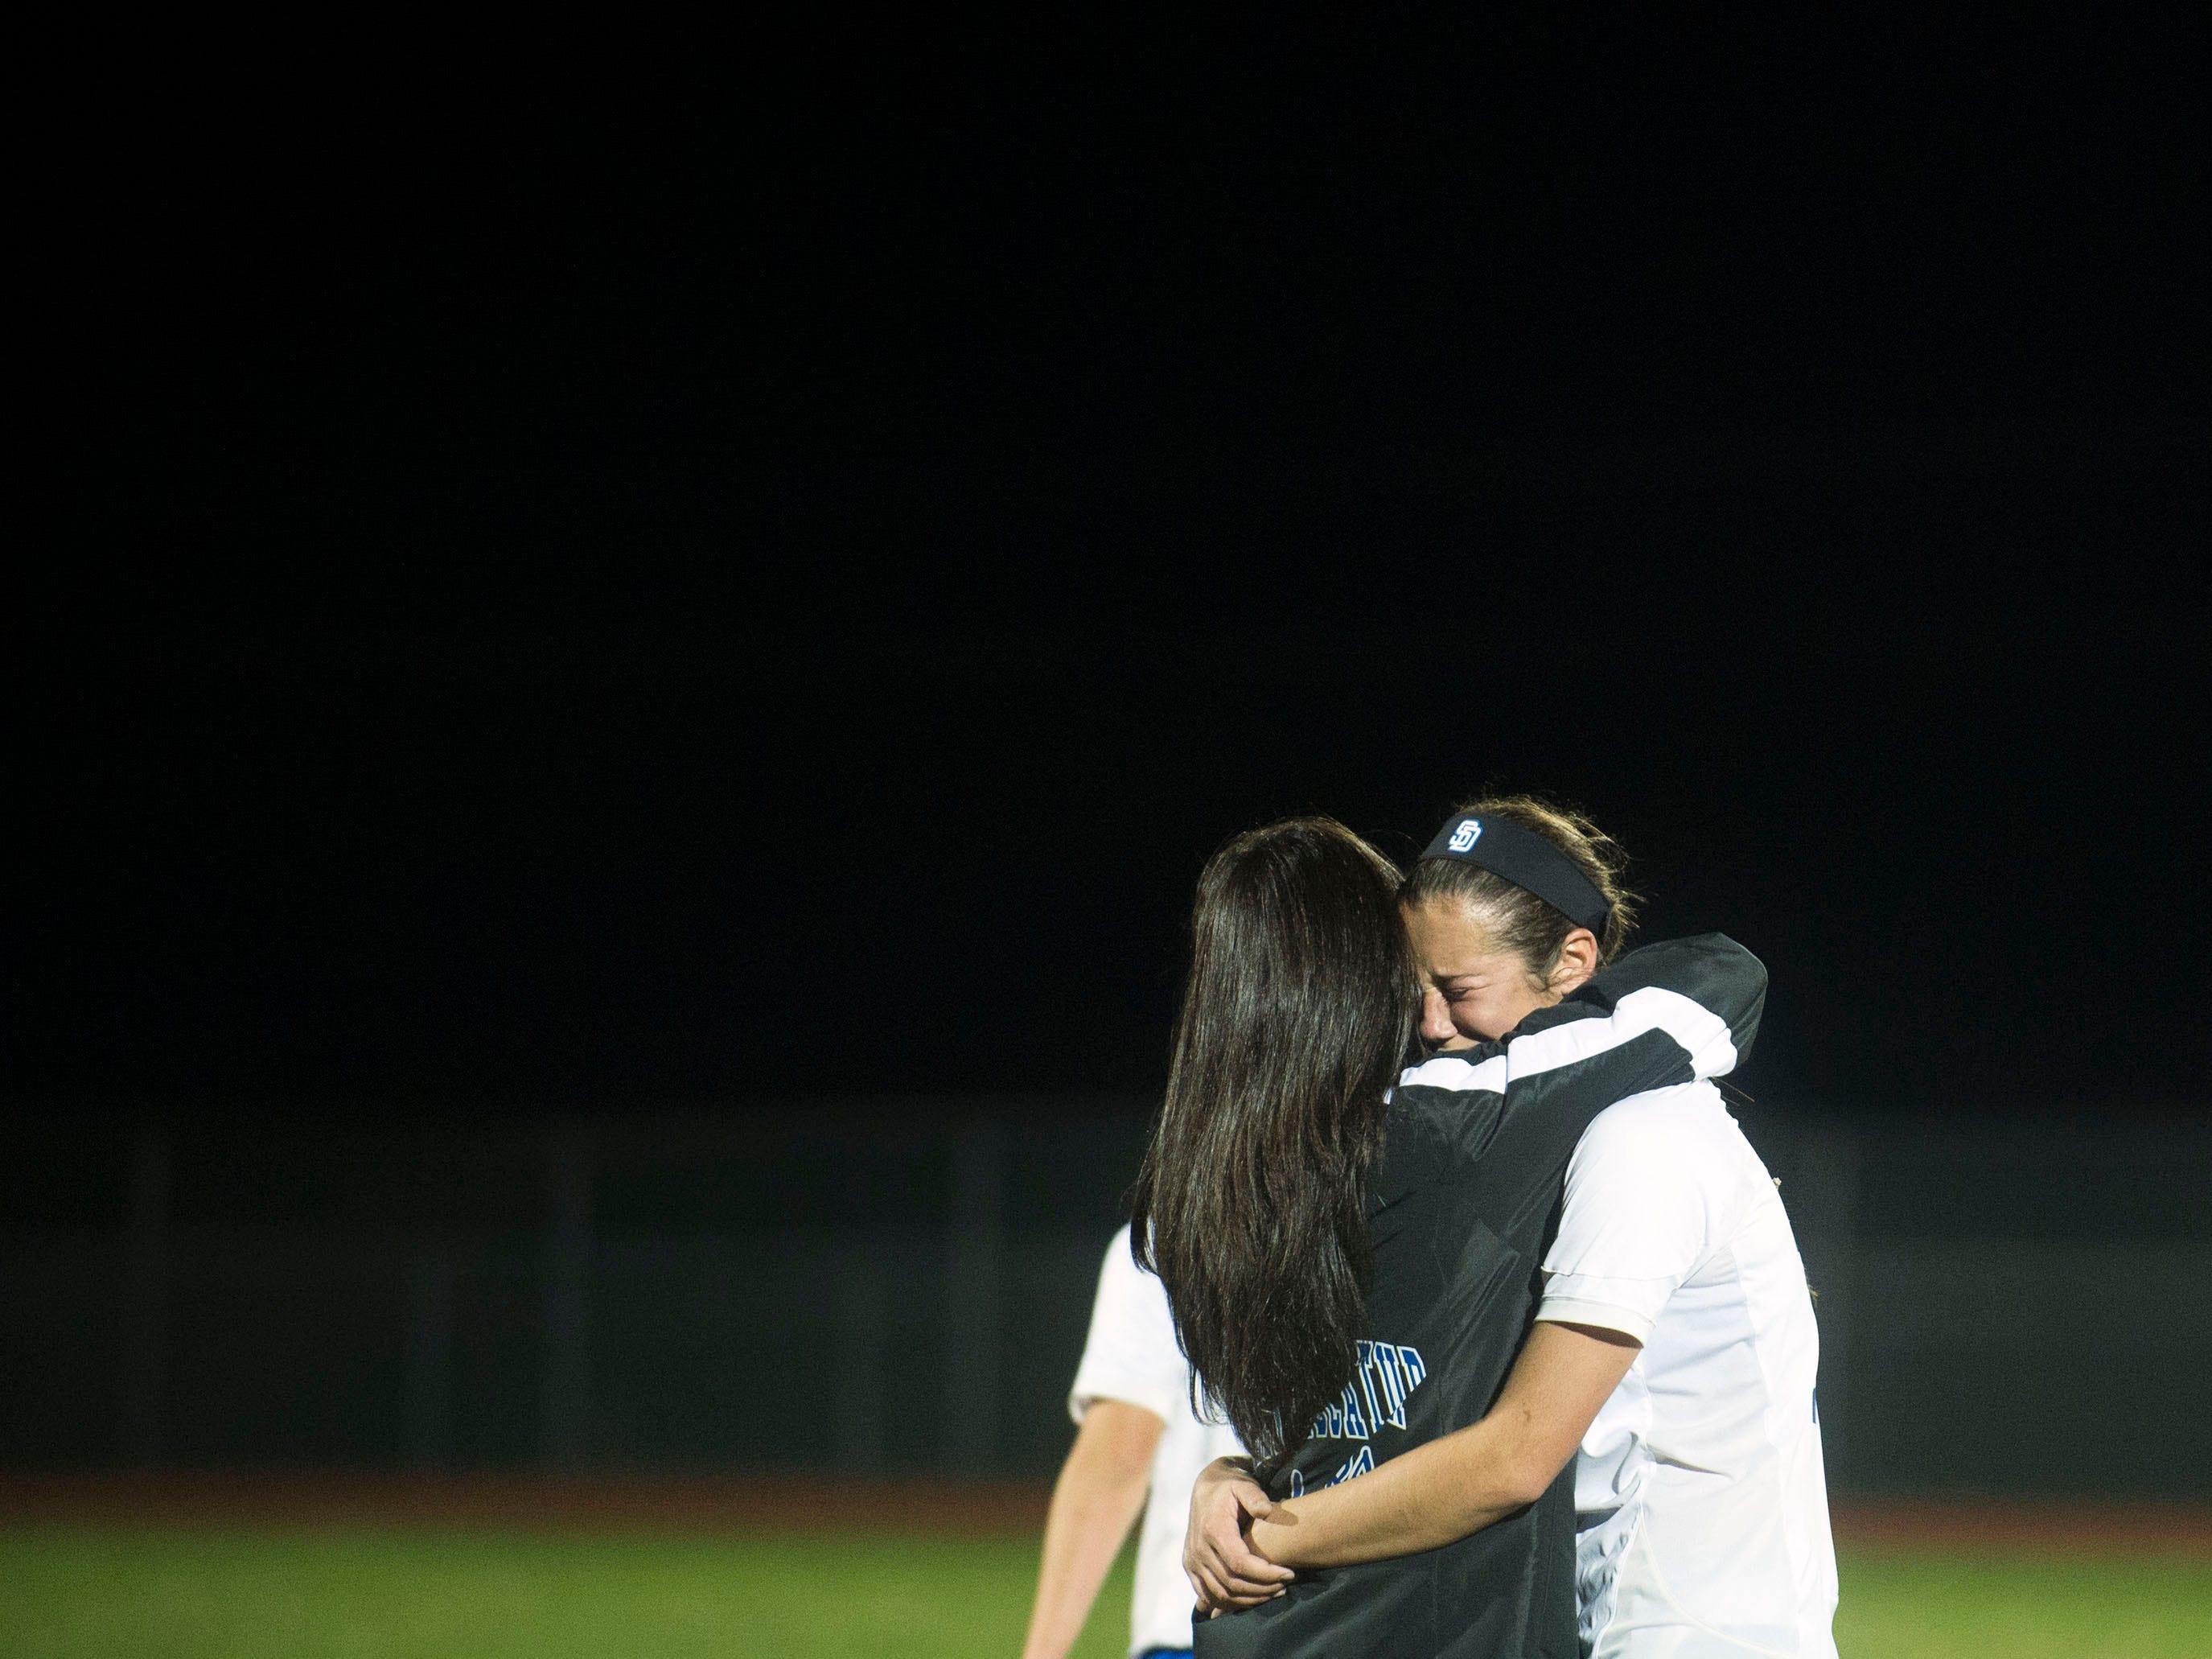 Decatur's Payton VanKirk hugs head coach Maggie Berke after a 3-1 season-ending loss over Northern Thursday night in Berlin.